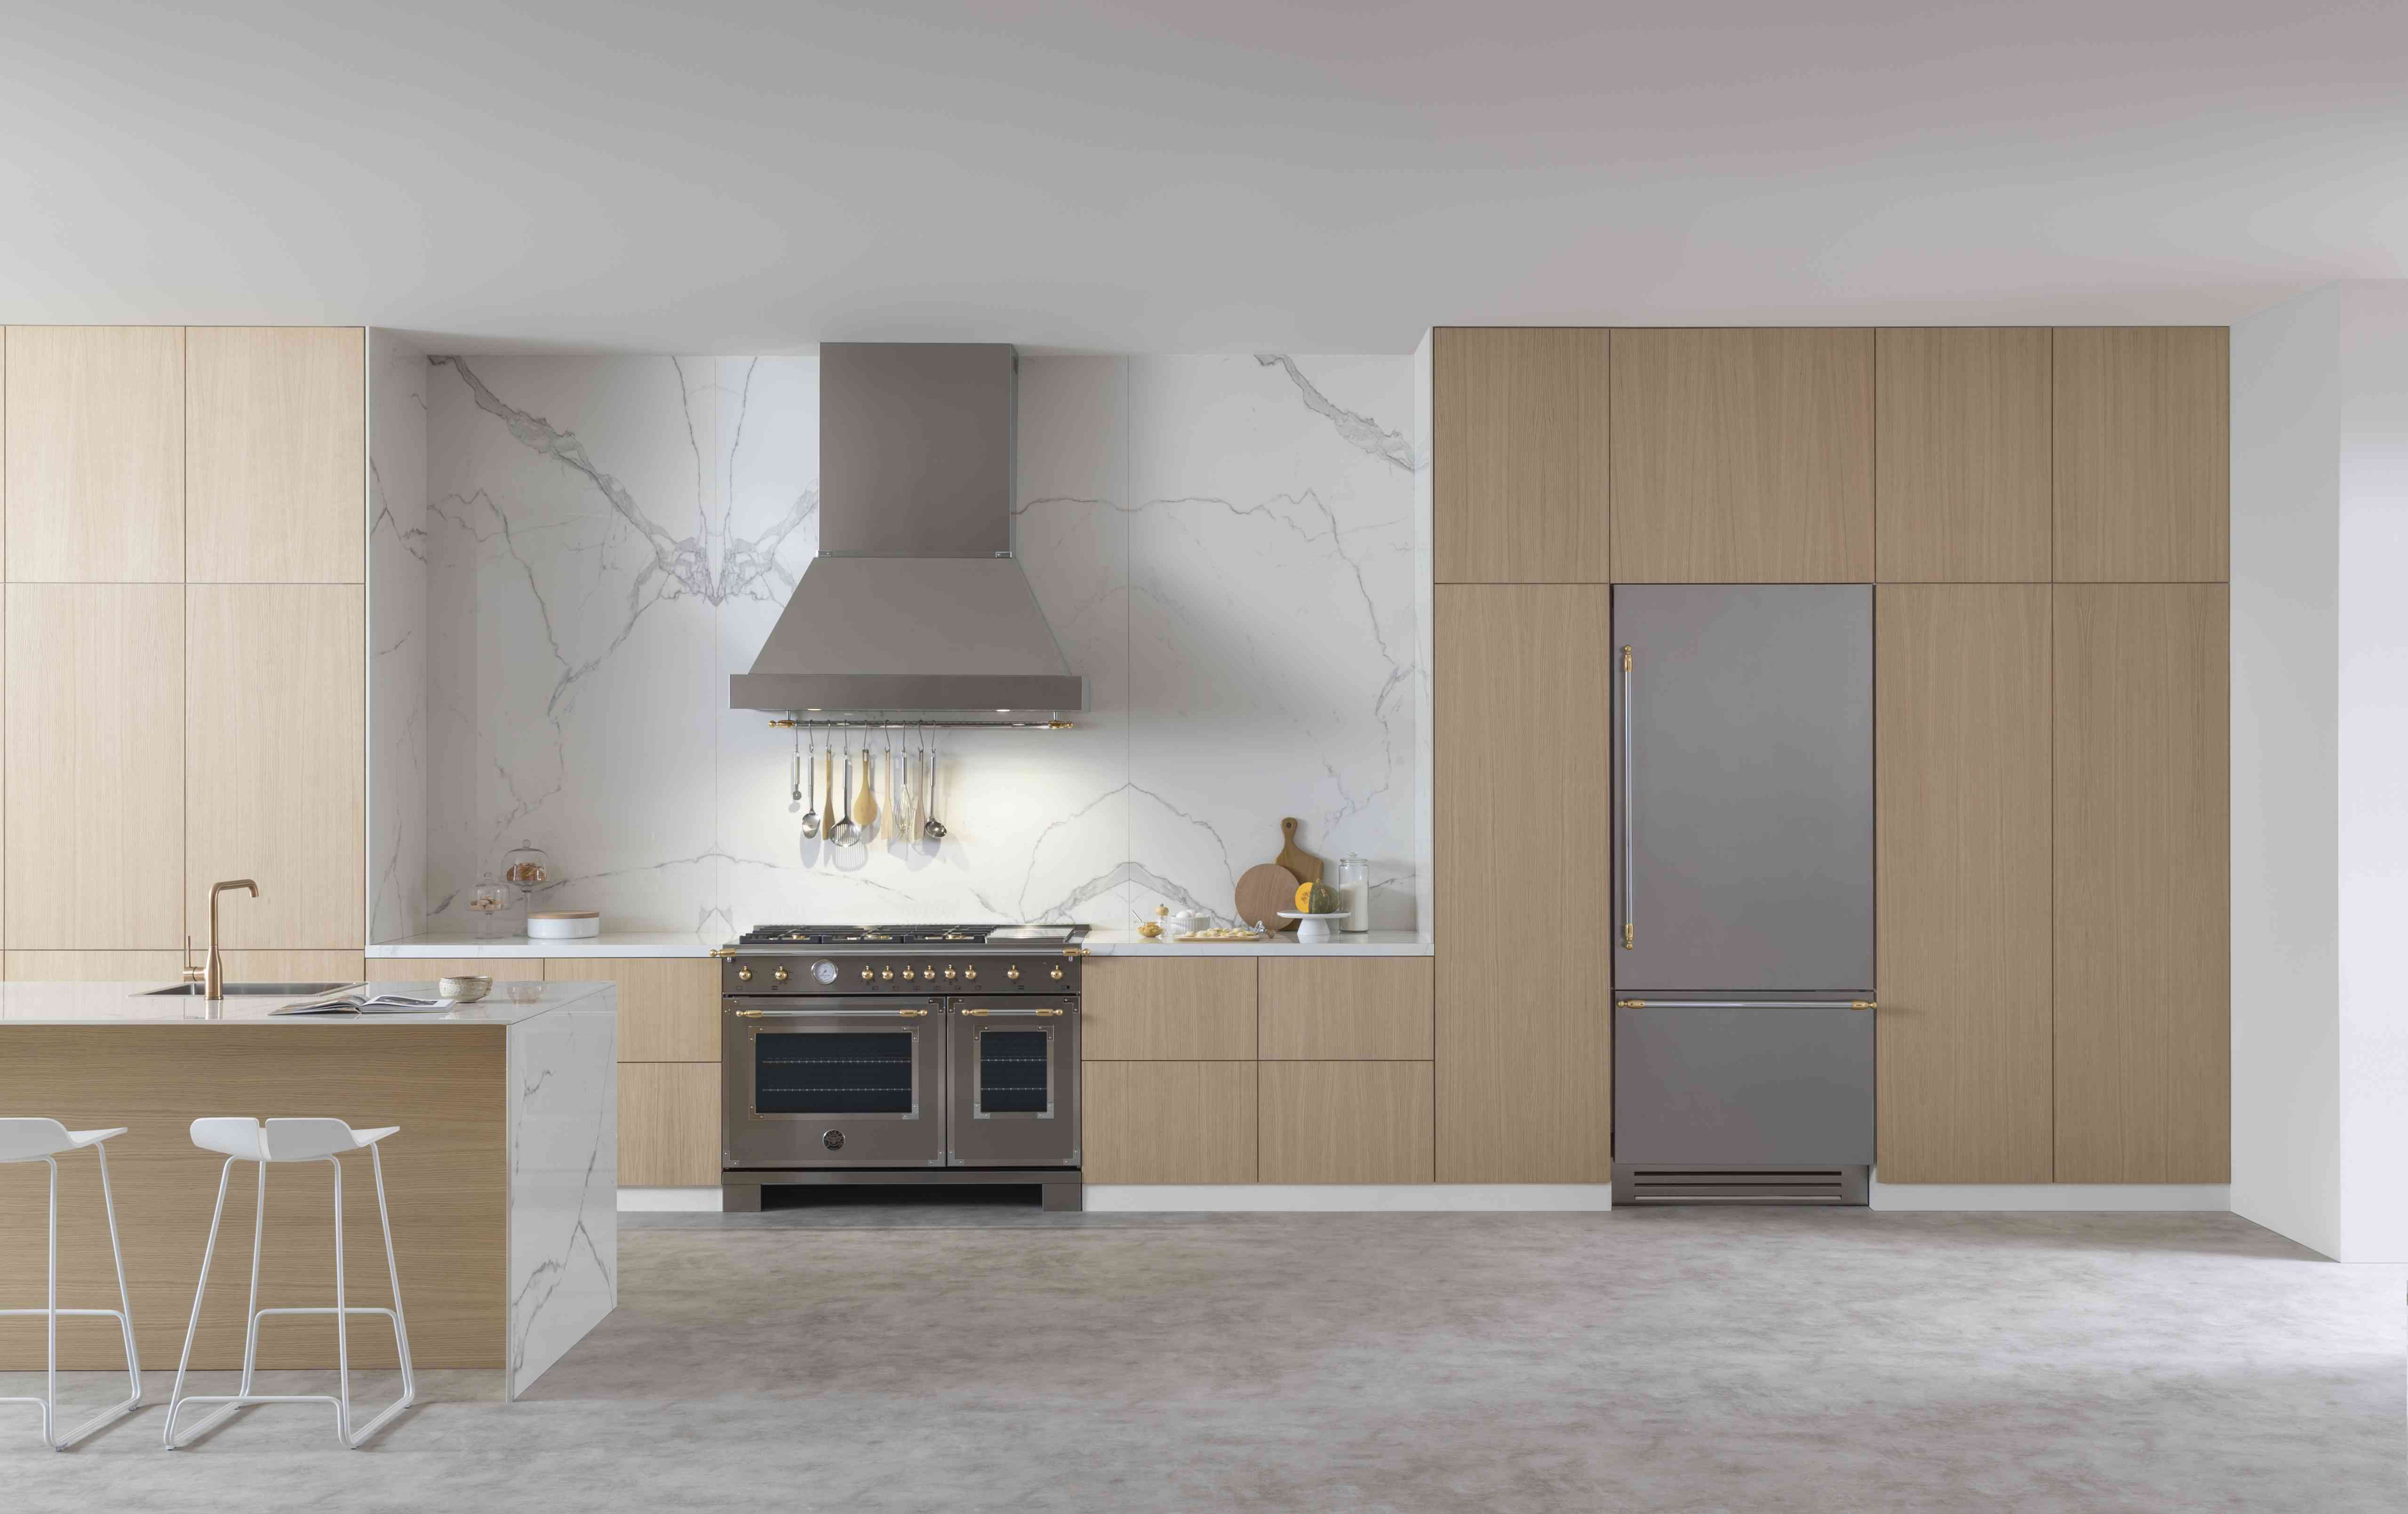 Sleek kitchen with light cabinets.